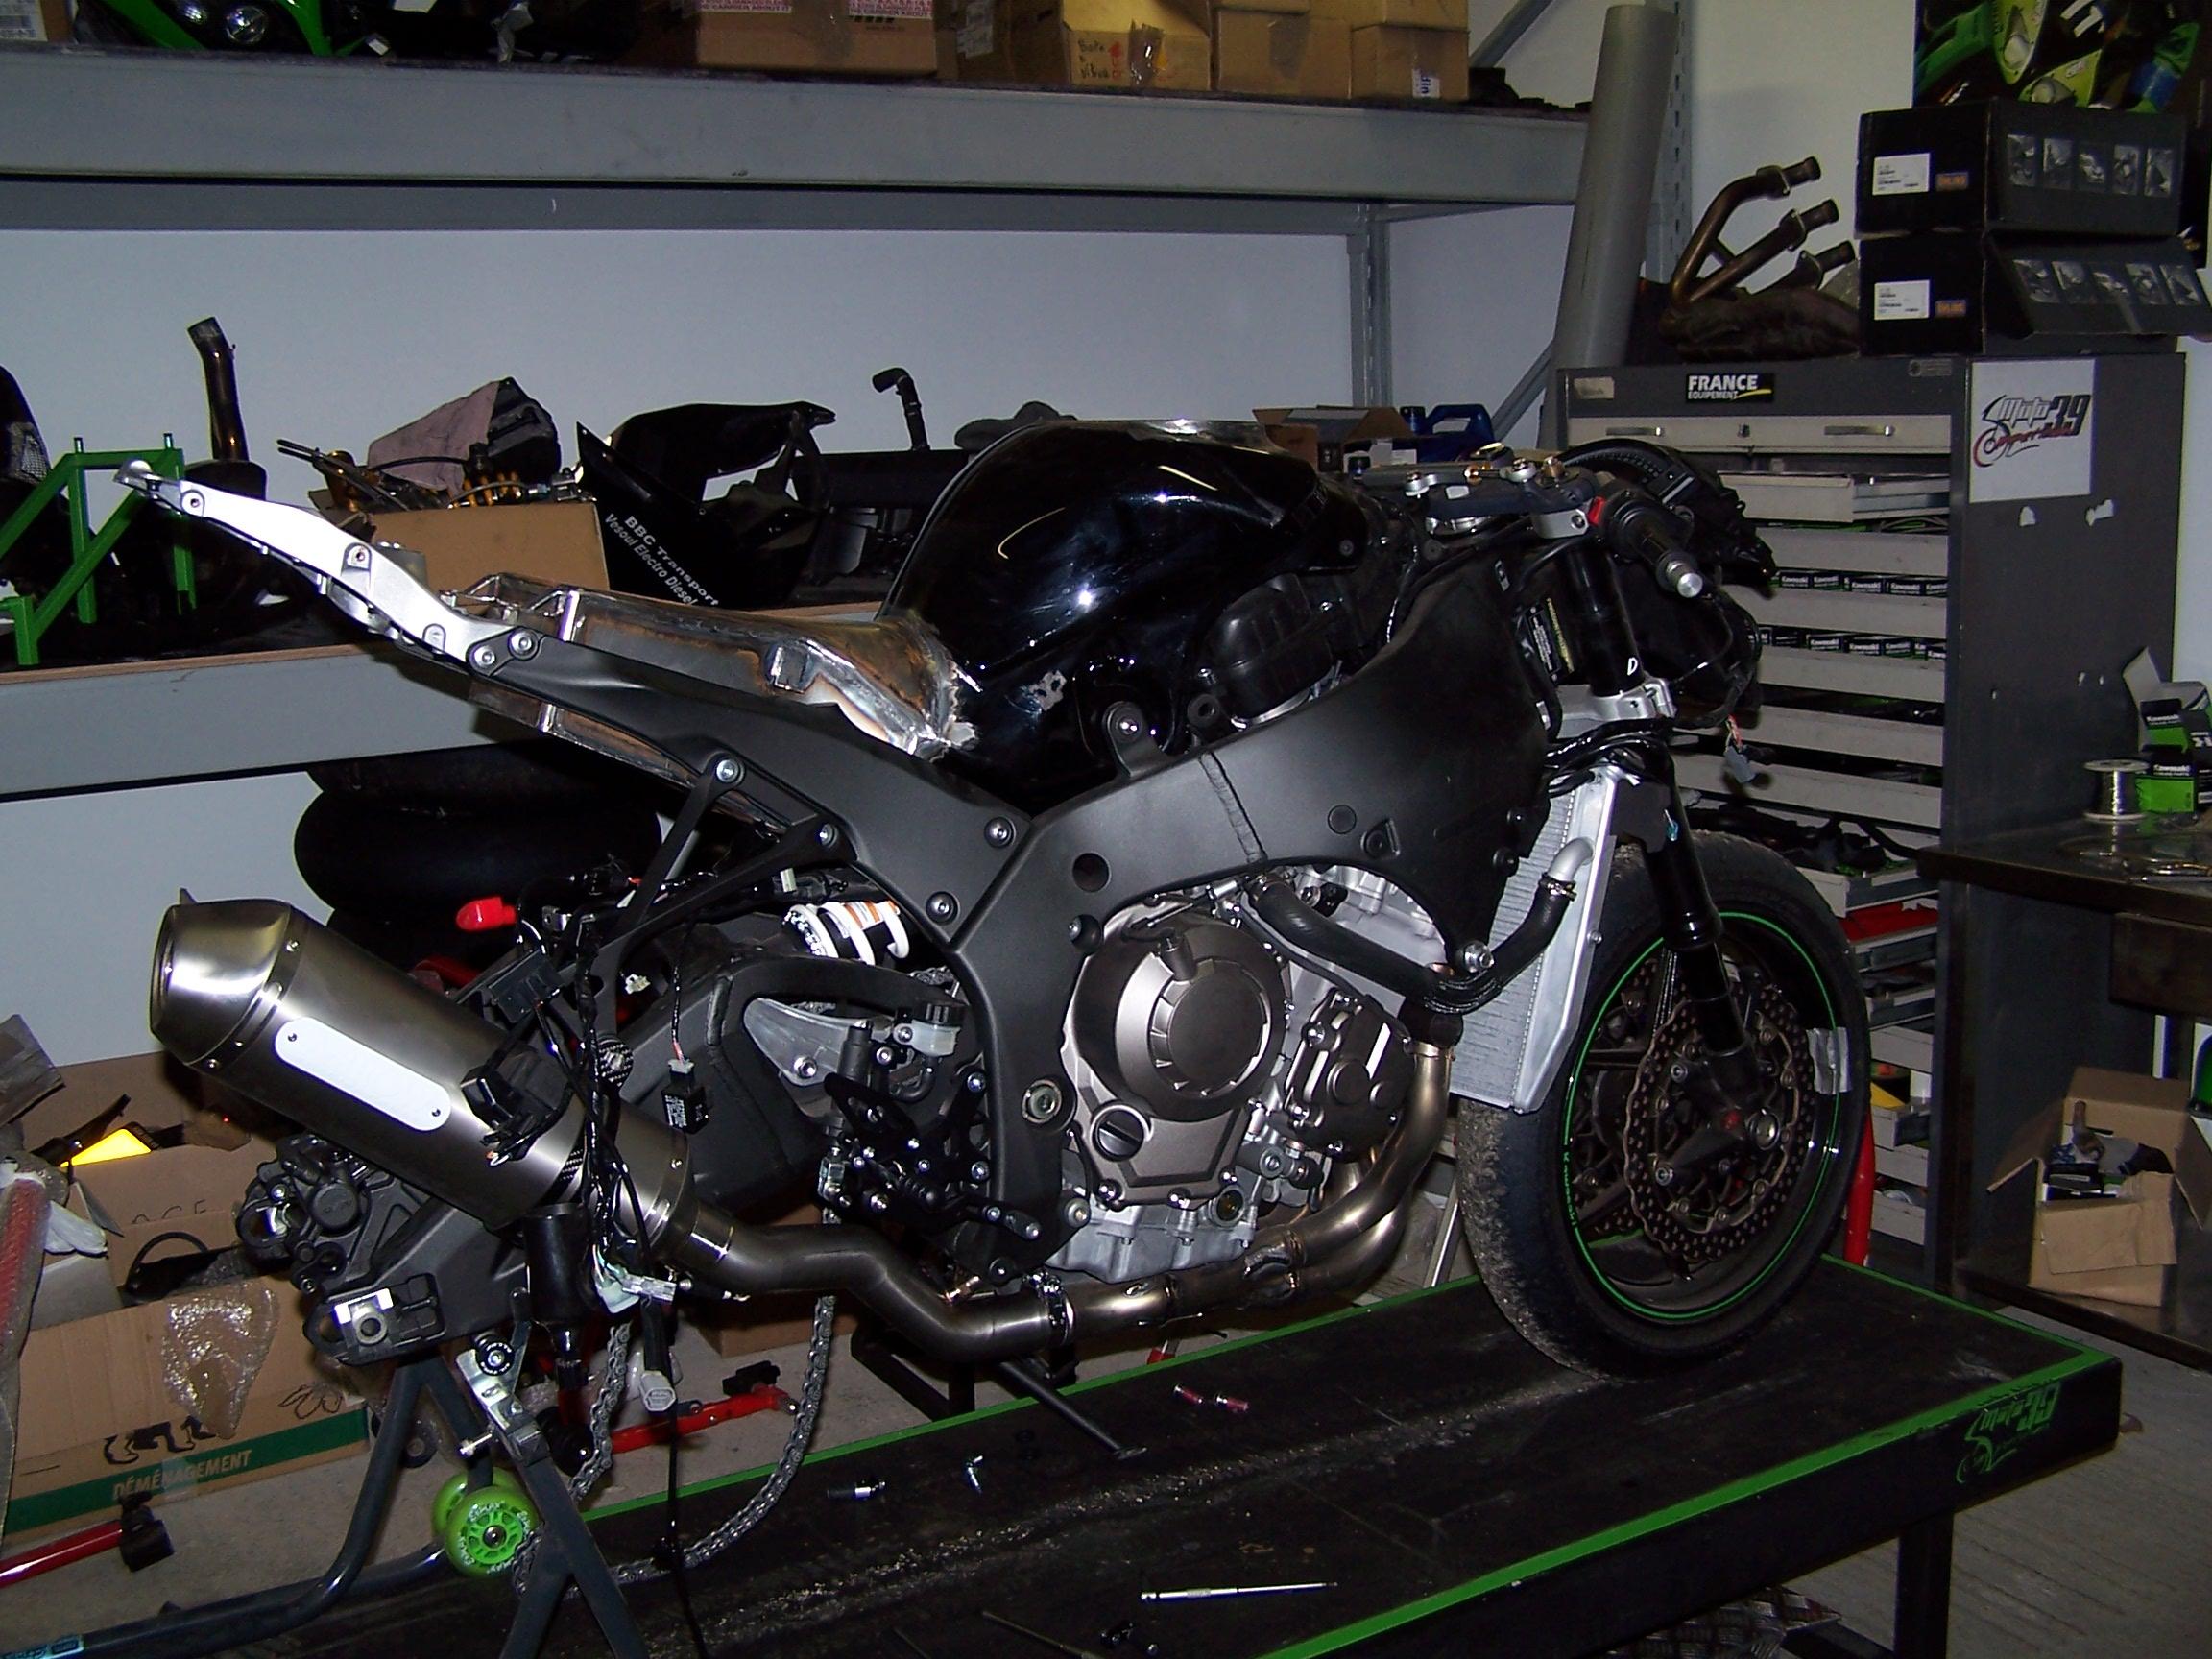 ZX10 R 2011